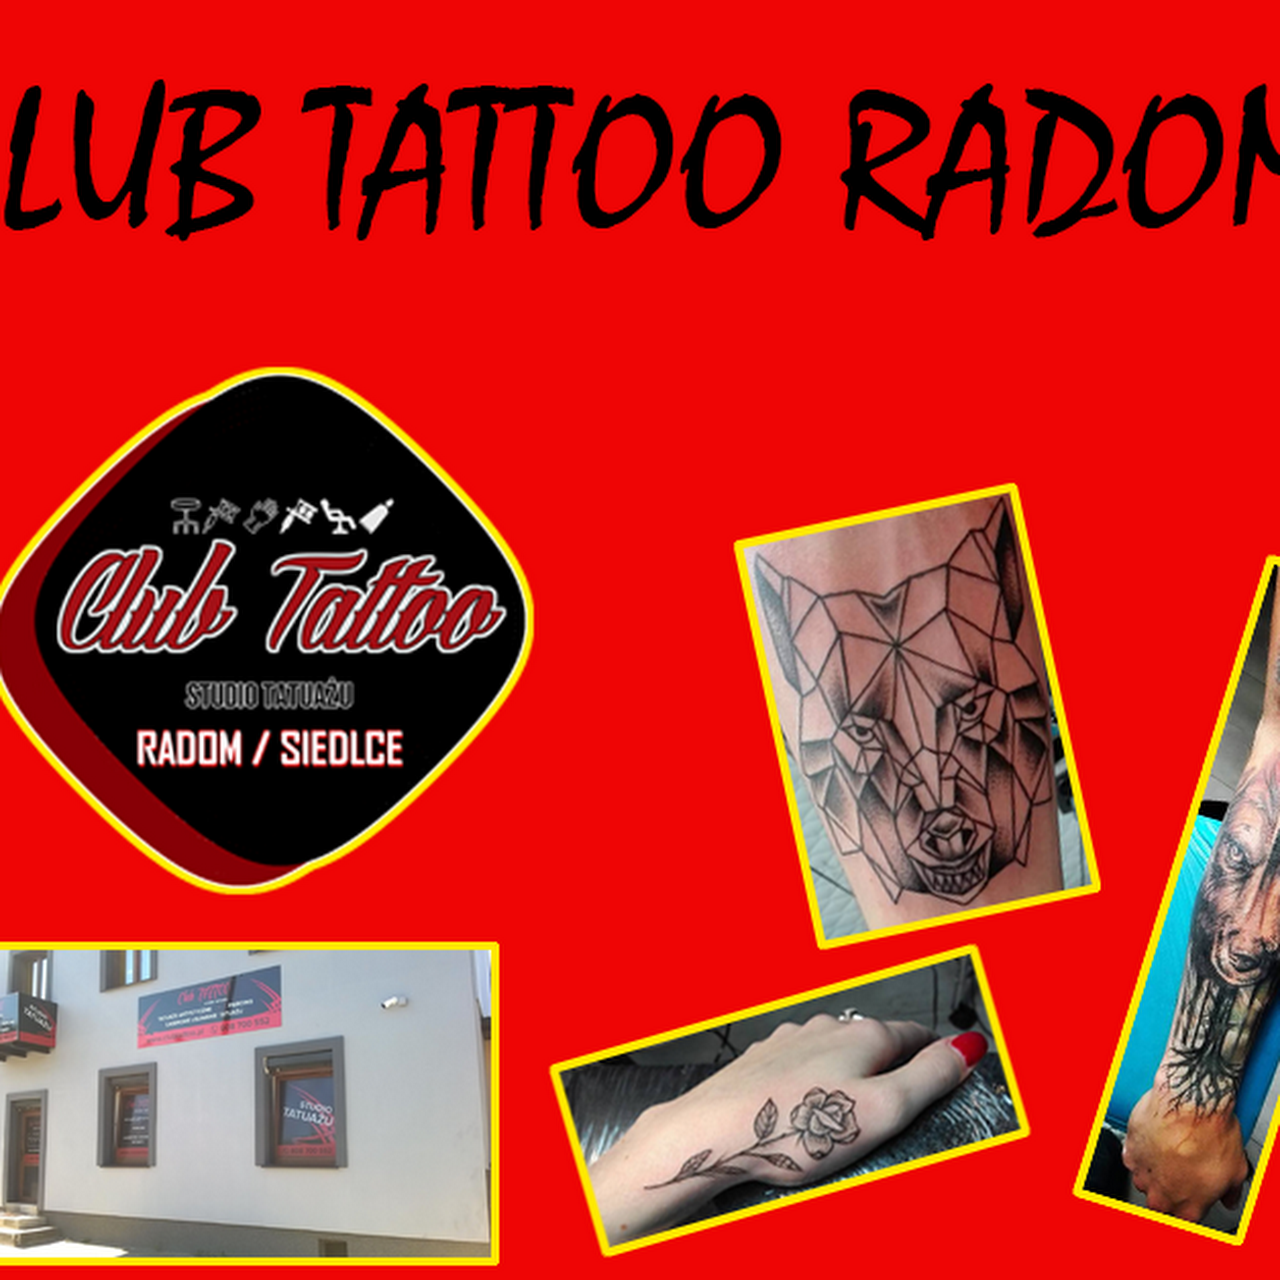 Club Tattoo Studio Tatuażu Radom Oraz Siedlce